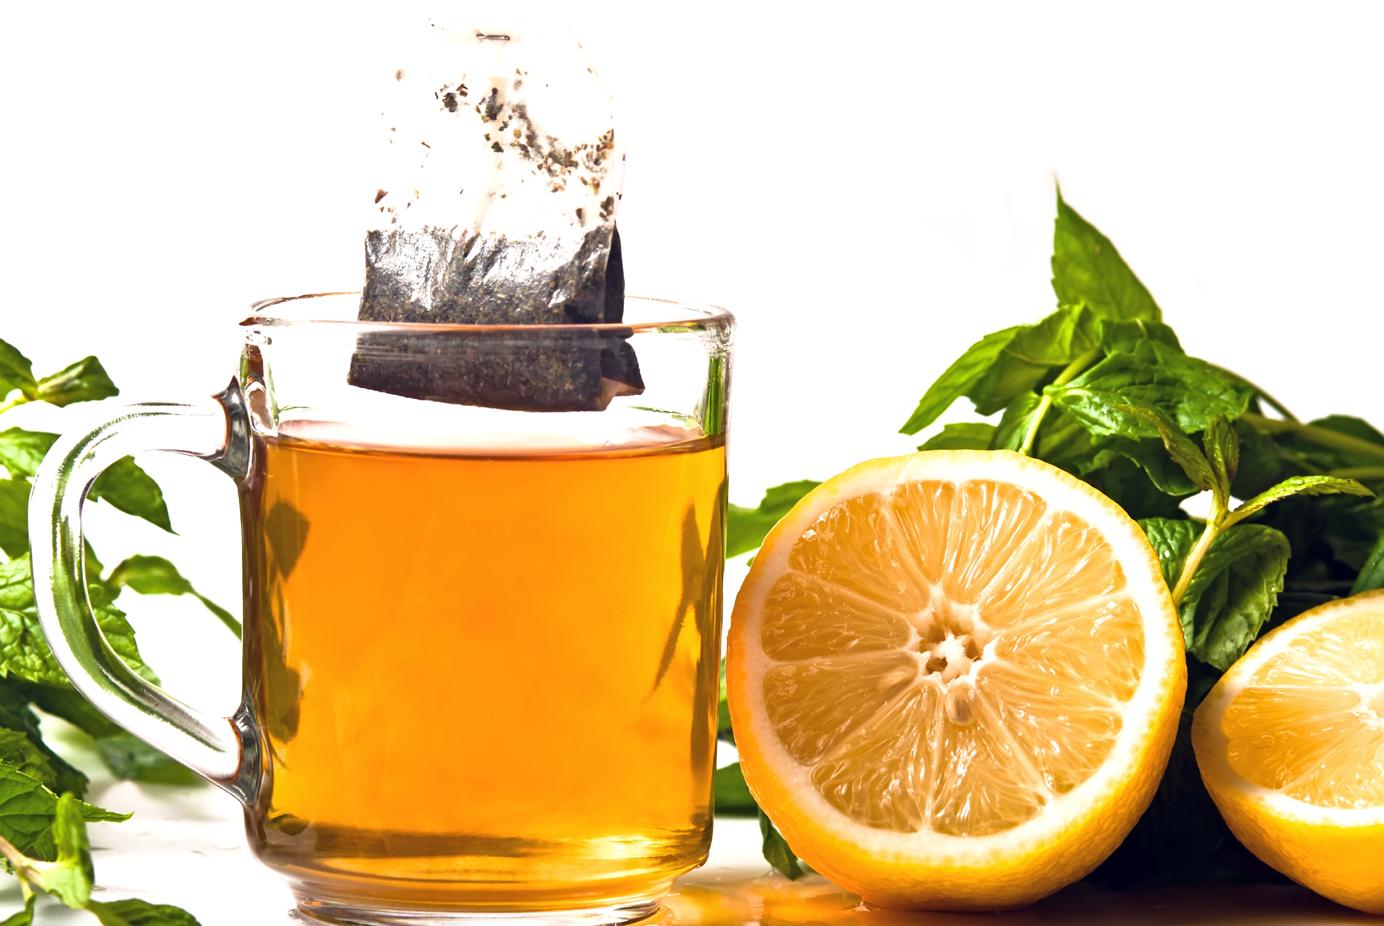 Teeglas mit Teebeutel und Zitrone